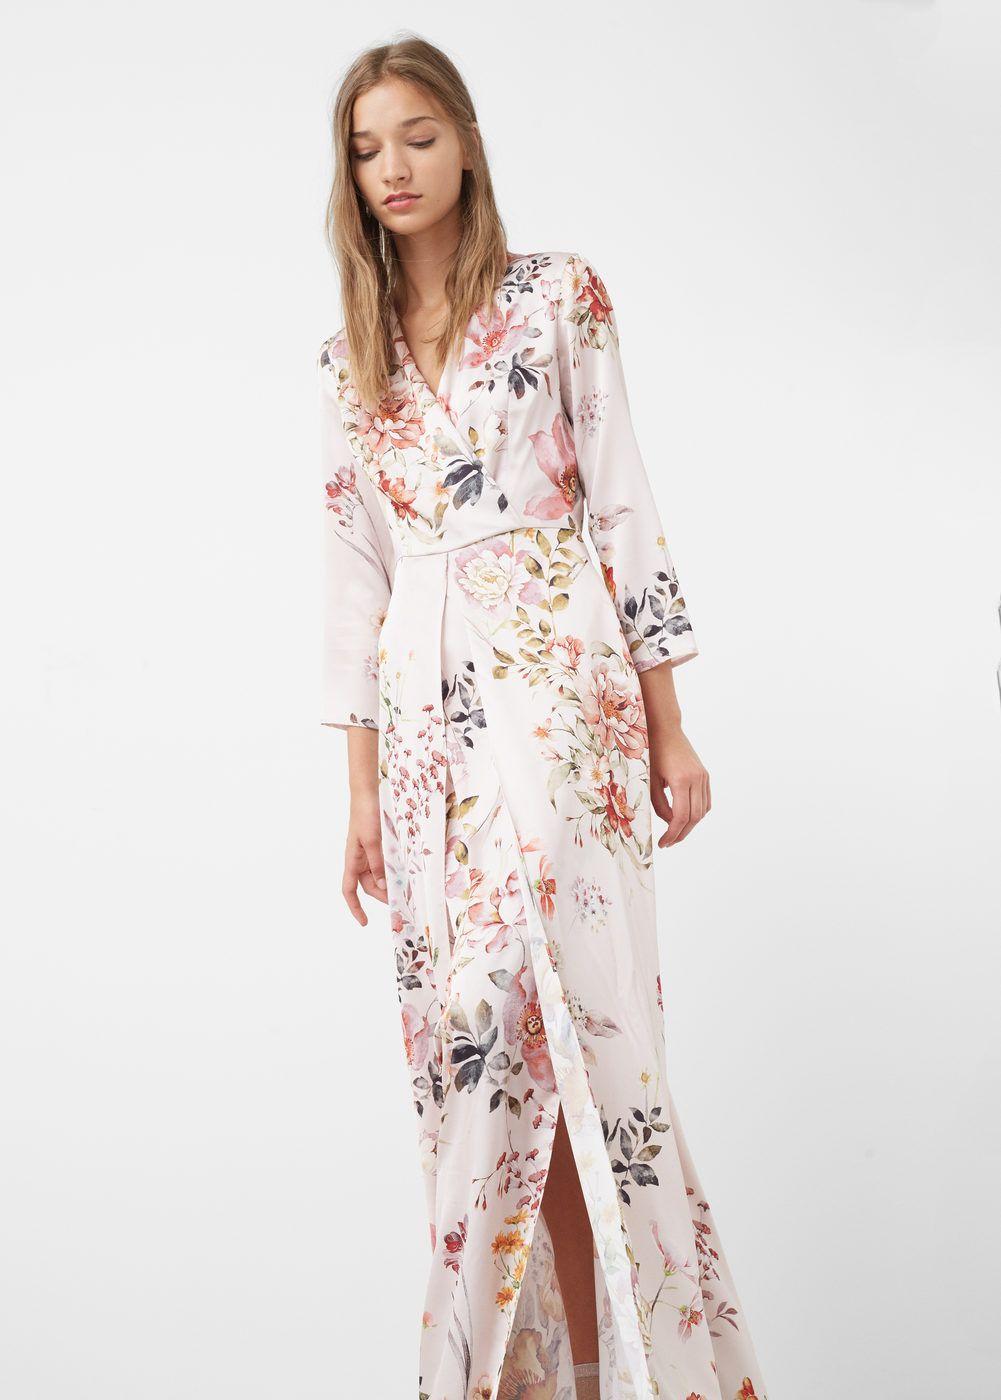 Fashion Moda Penélope Cruz In Vogue June Issue: Vestido Comprido Floral - Mulher Em 2019